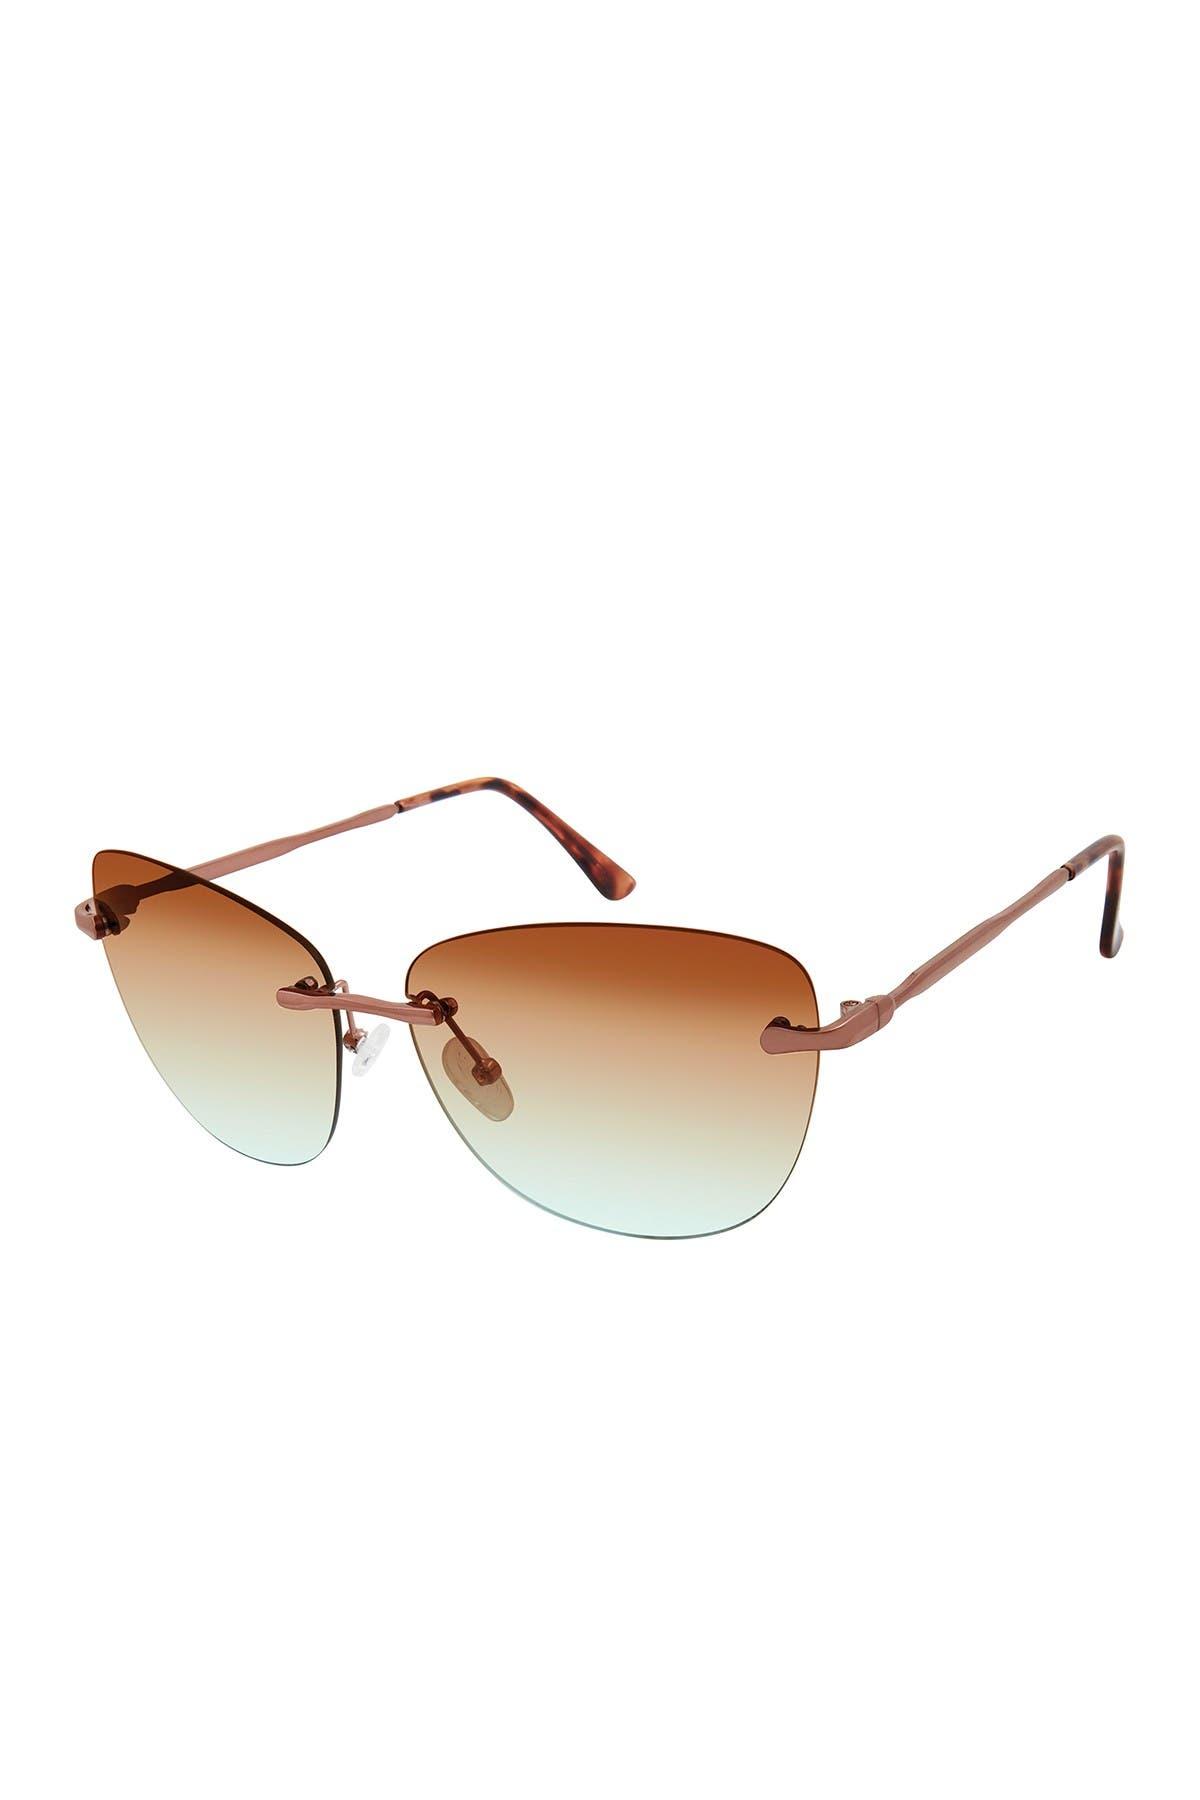 Image of True Religion 54mm Geometric Rimless Sunglasses